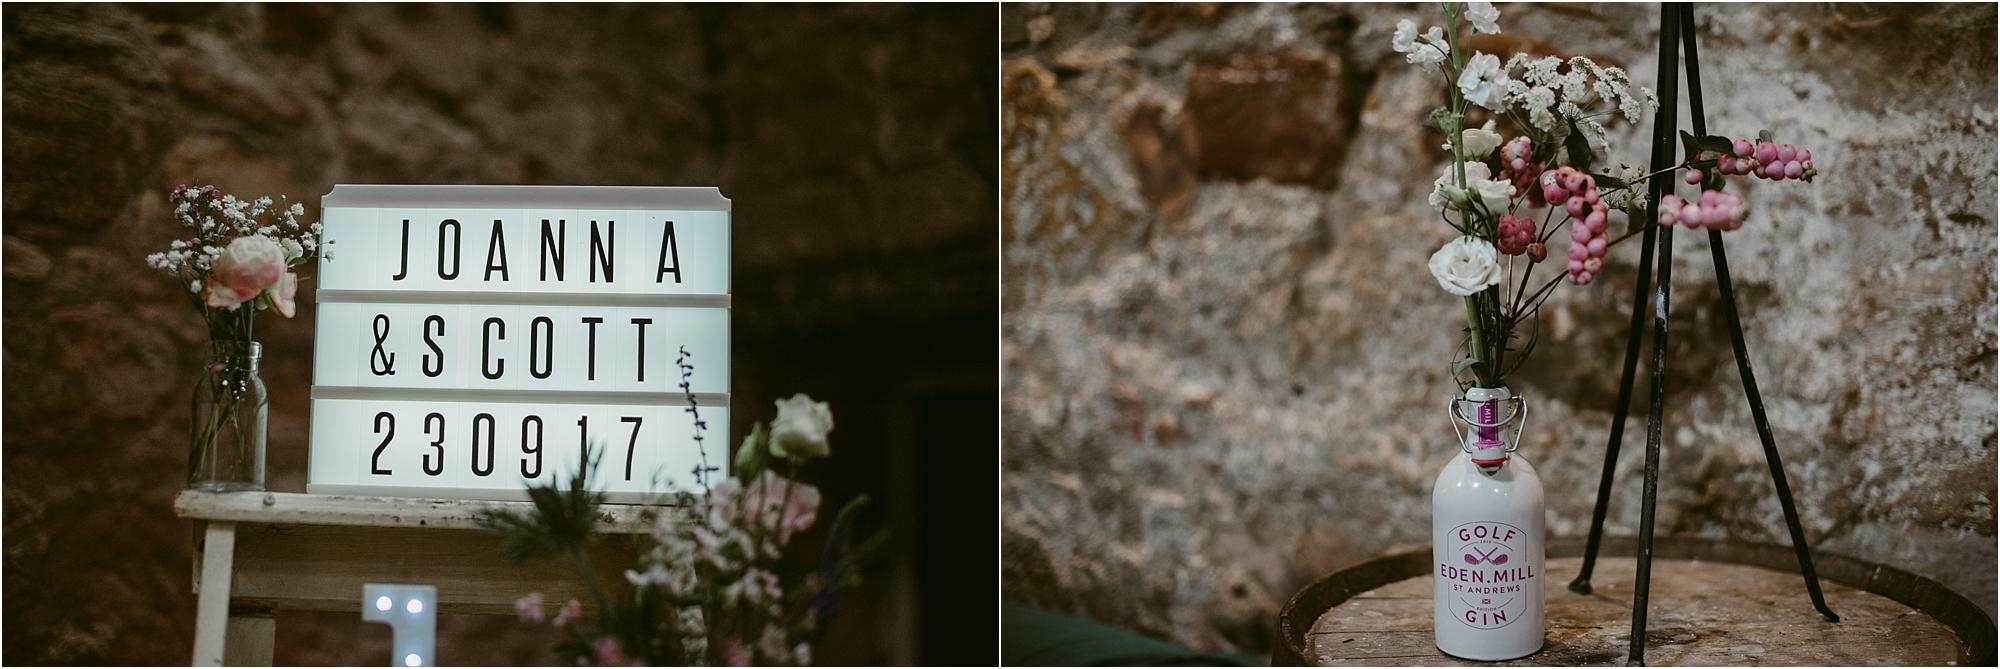 Scott+Joanna-Kinkell-Byre-wedding-fife-photography__0064.jpg